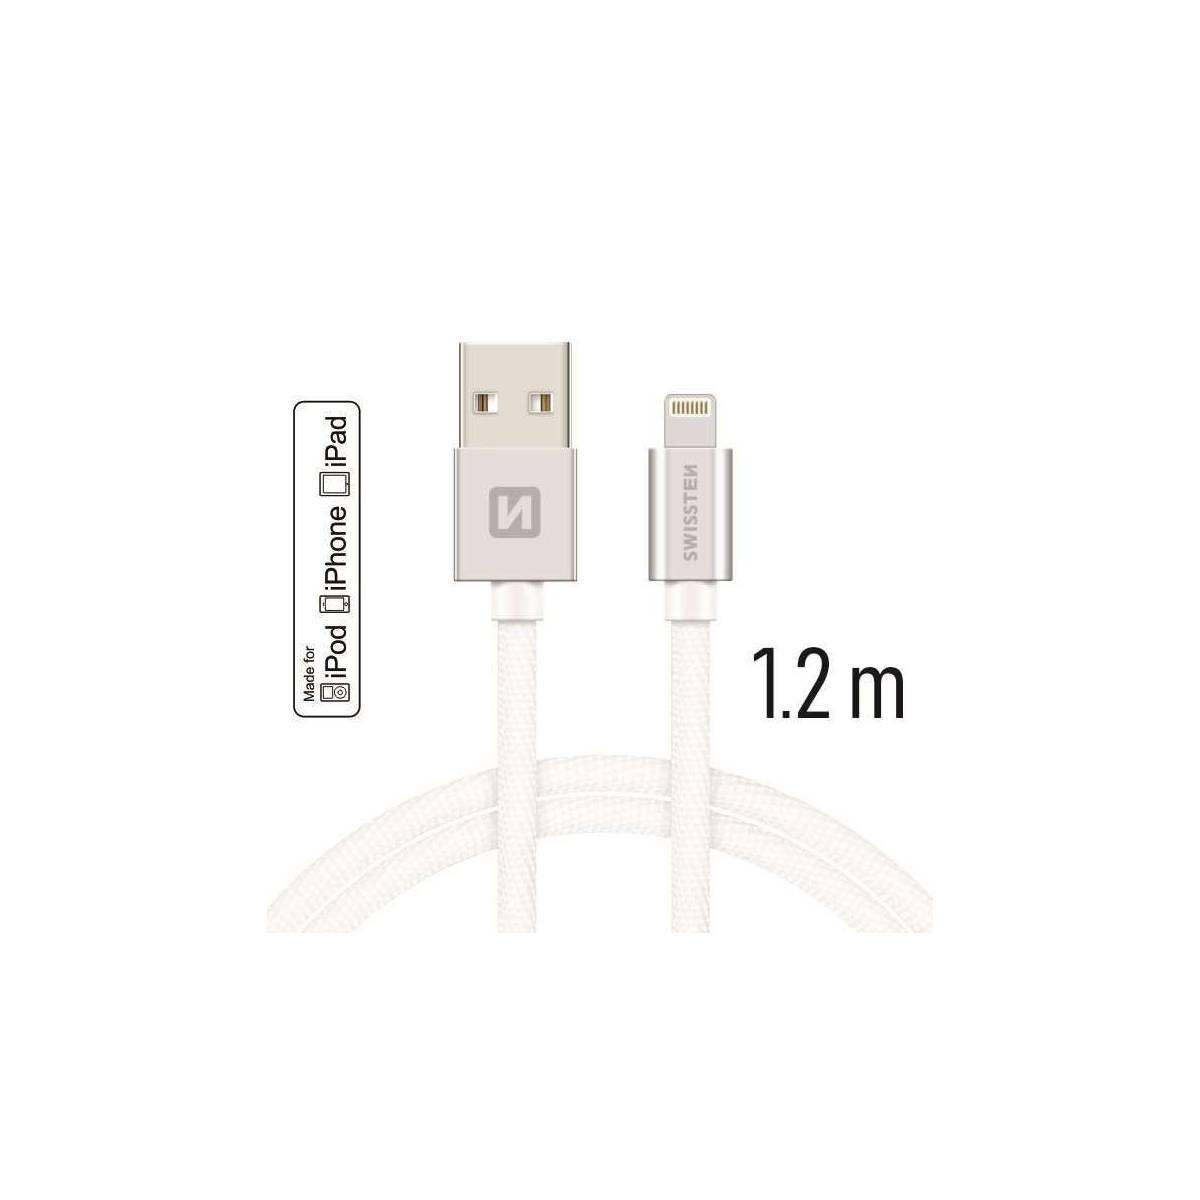 Swissten 1,2m2m MFI Lightning kabel Mackablar.se fra